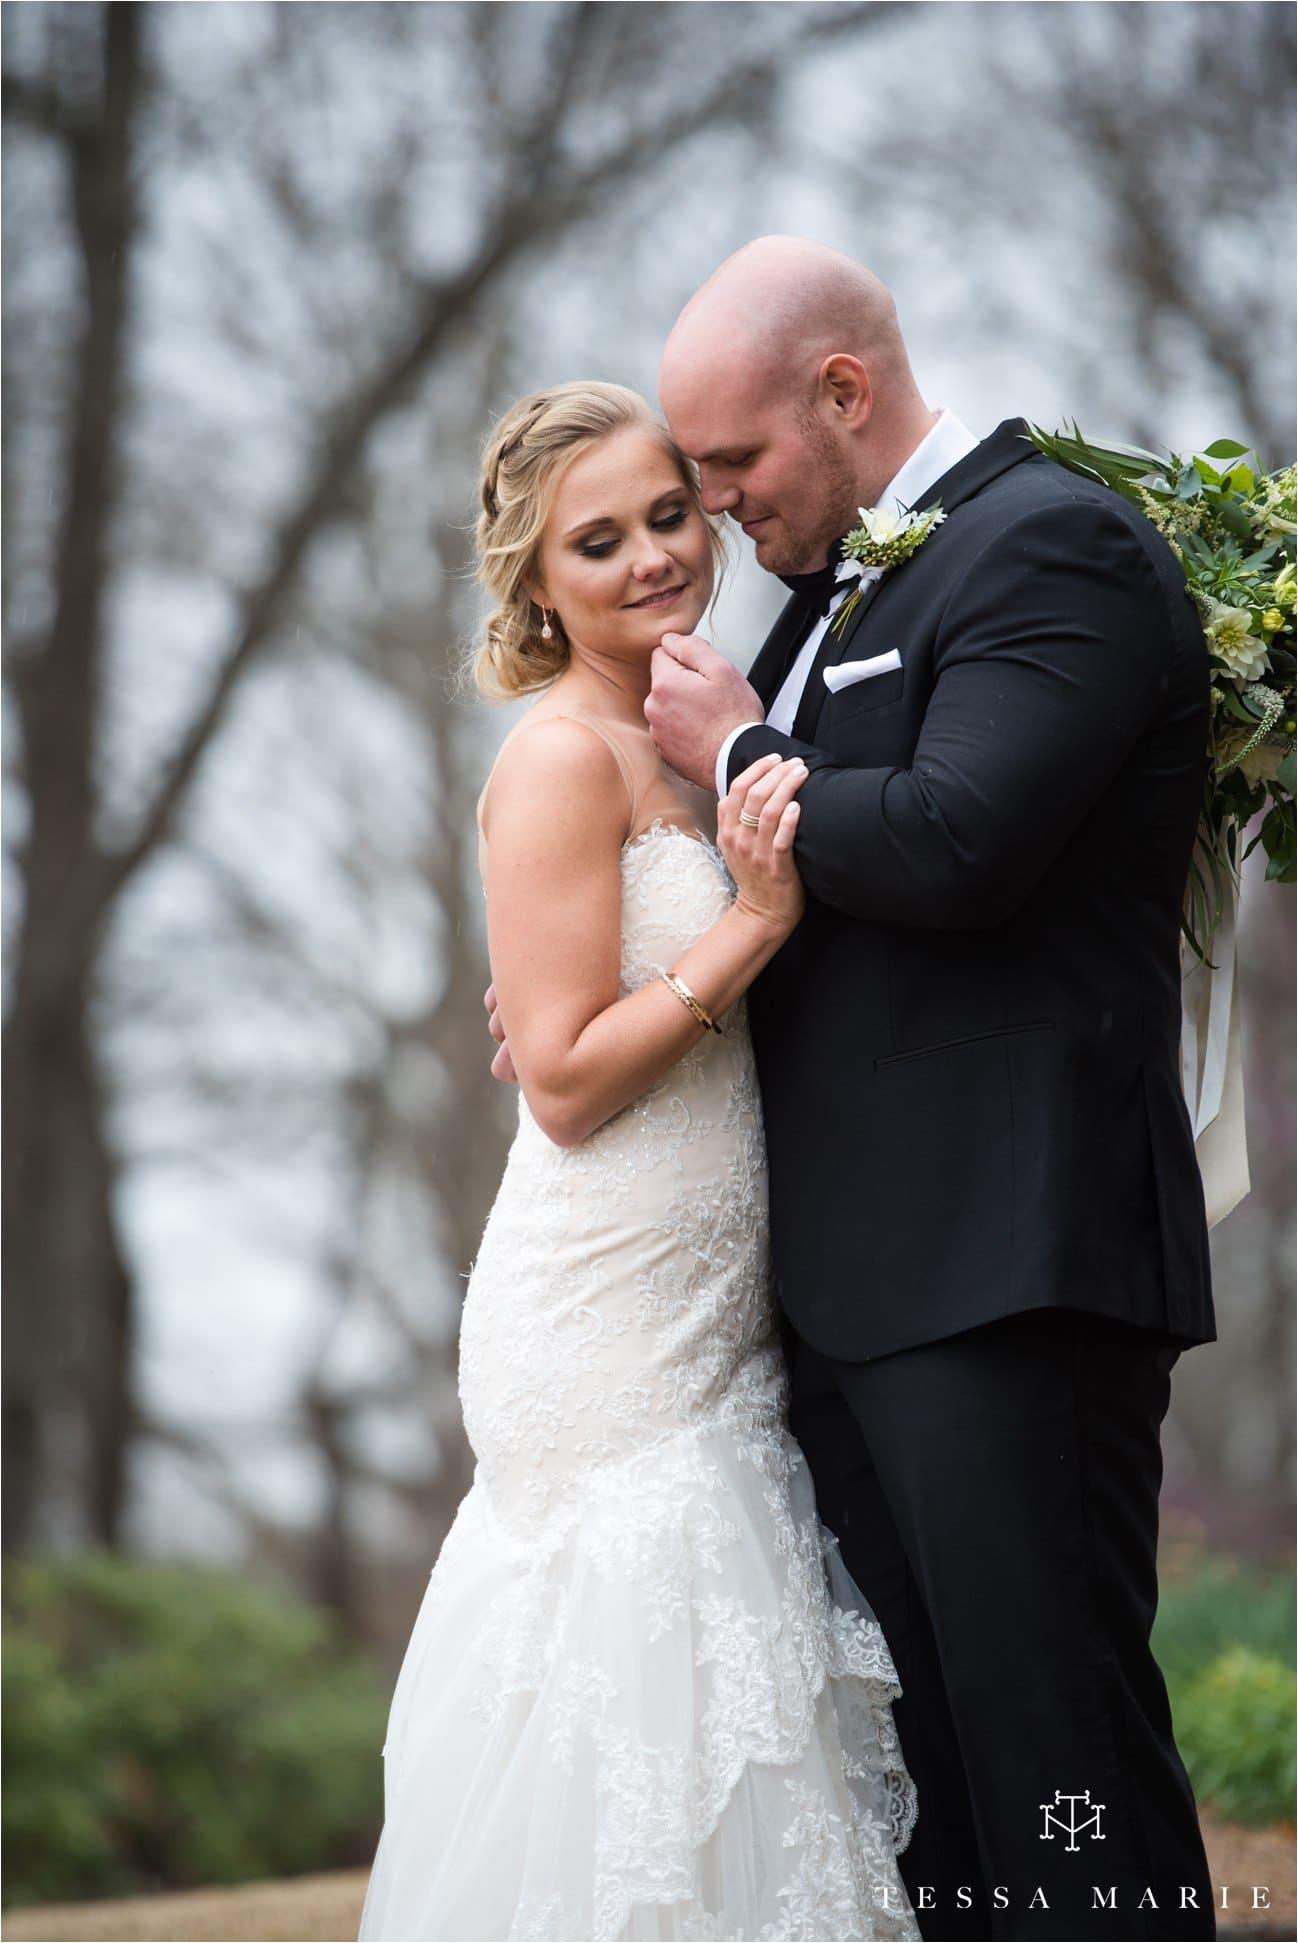 tessa_marie_studios_little_river_Farm_wedding_pictures_tessa_marie_weddings_0330